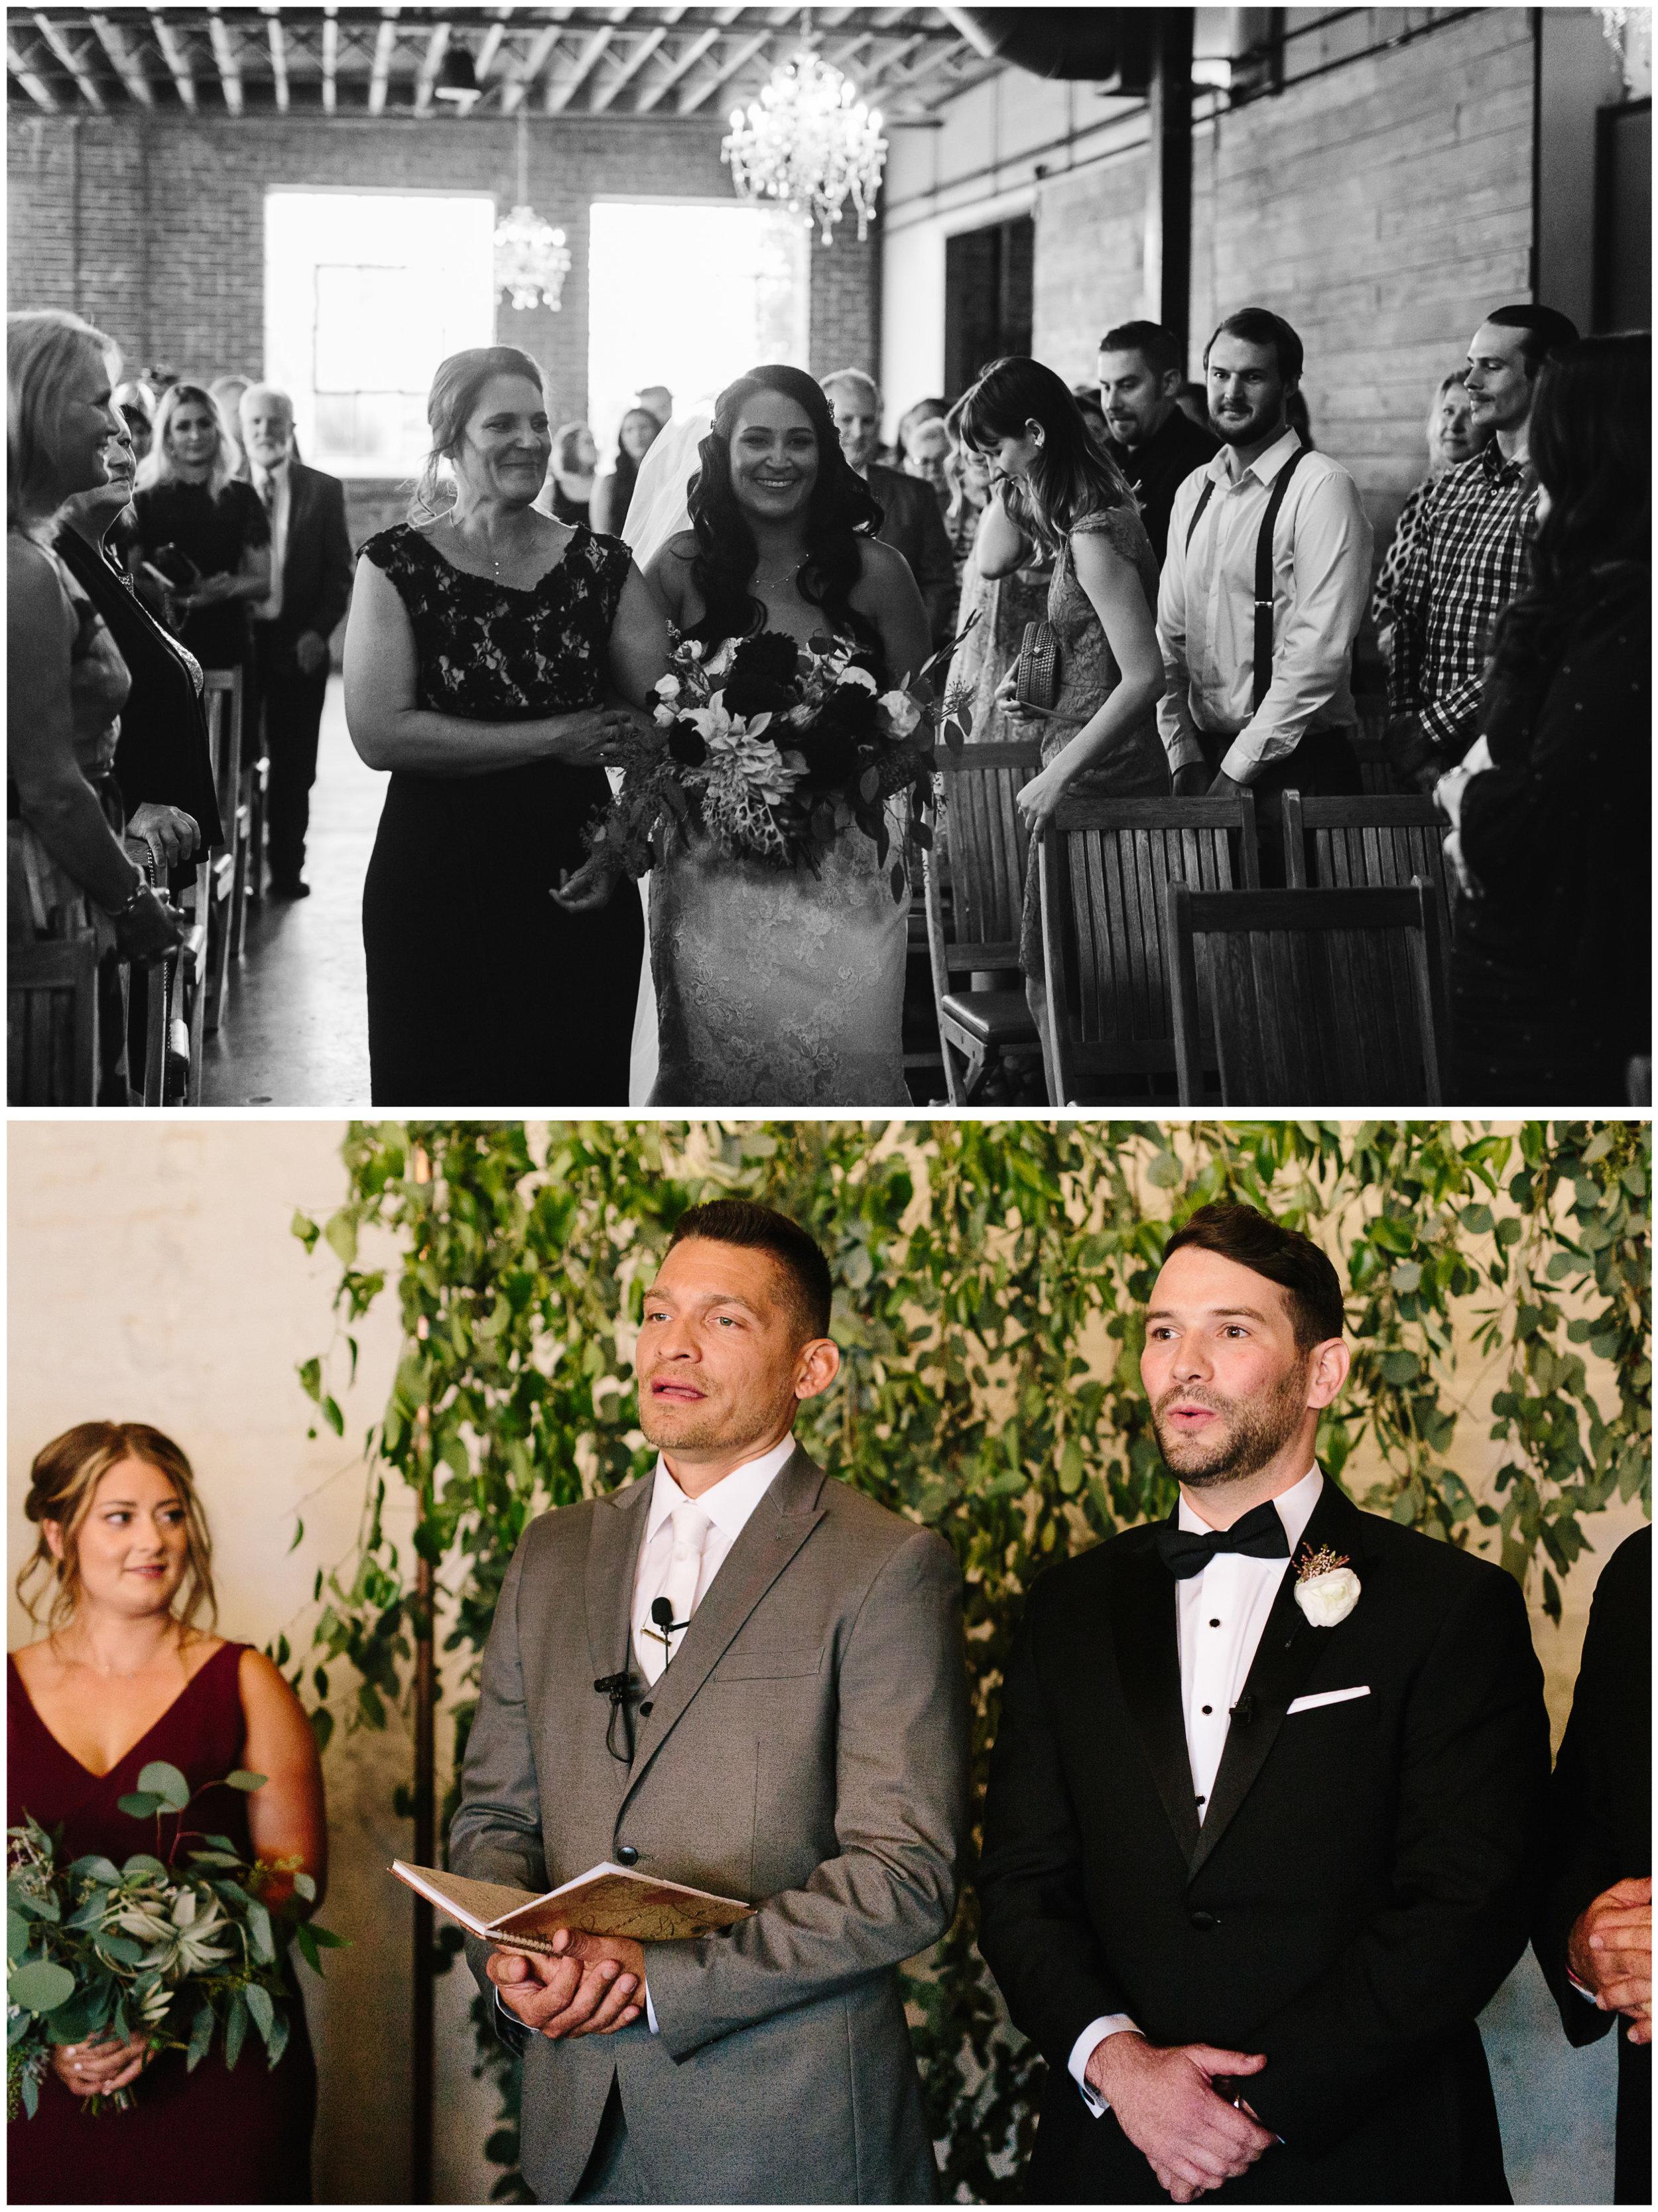 moss_denver_wedding_48.jpg